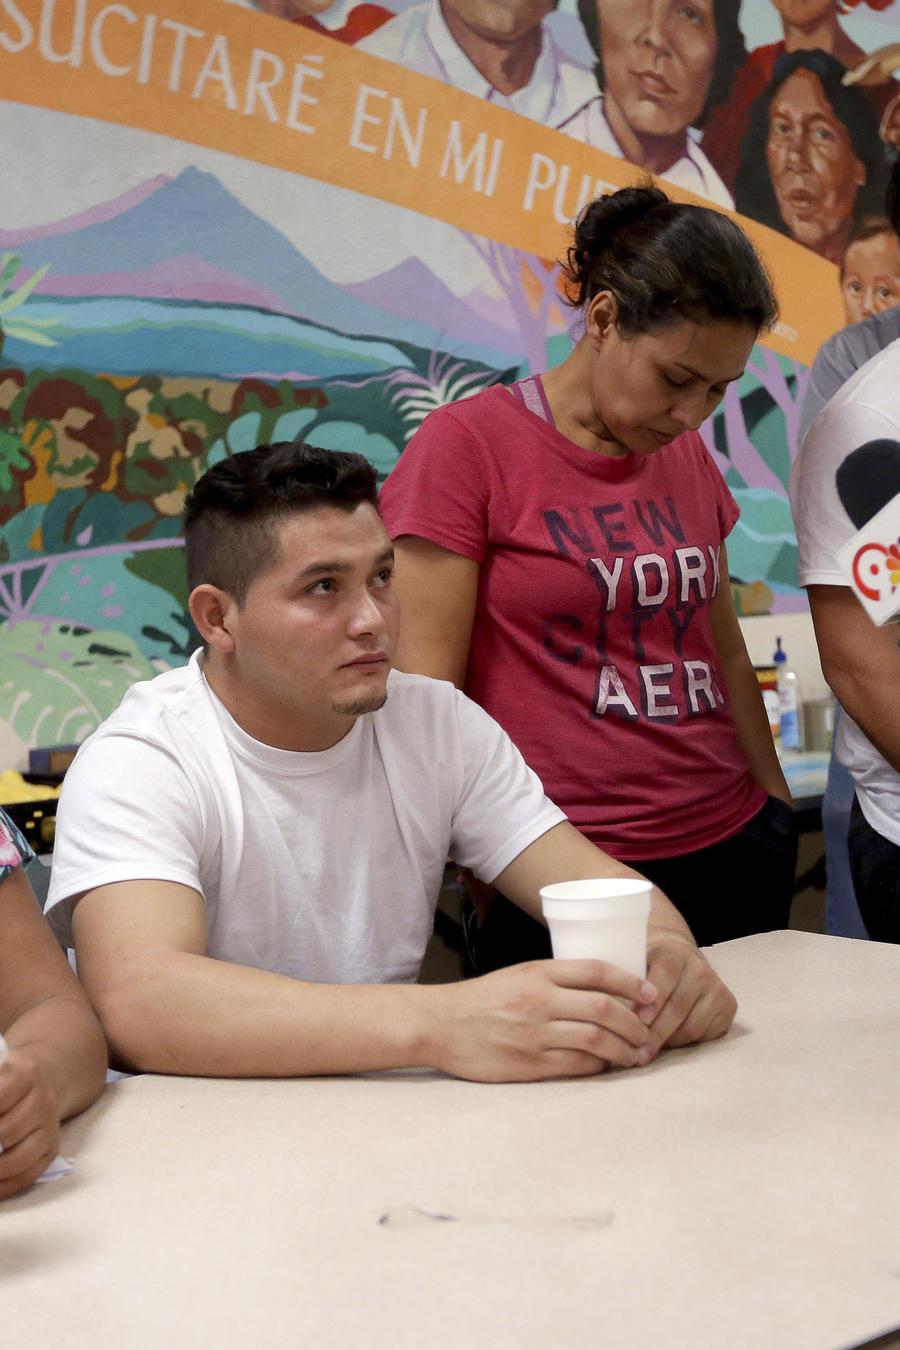 Familia de inmigrantes